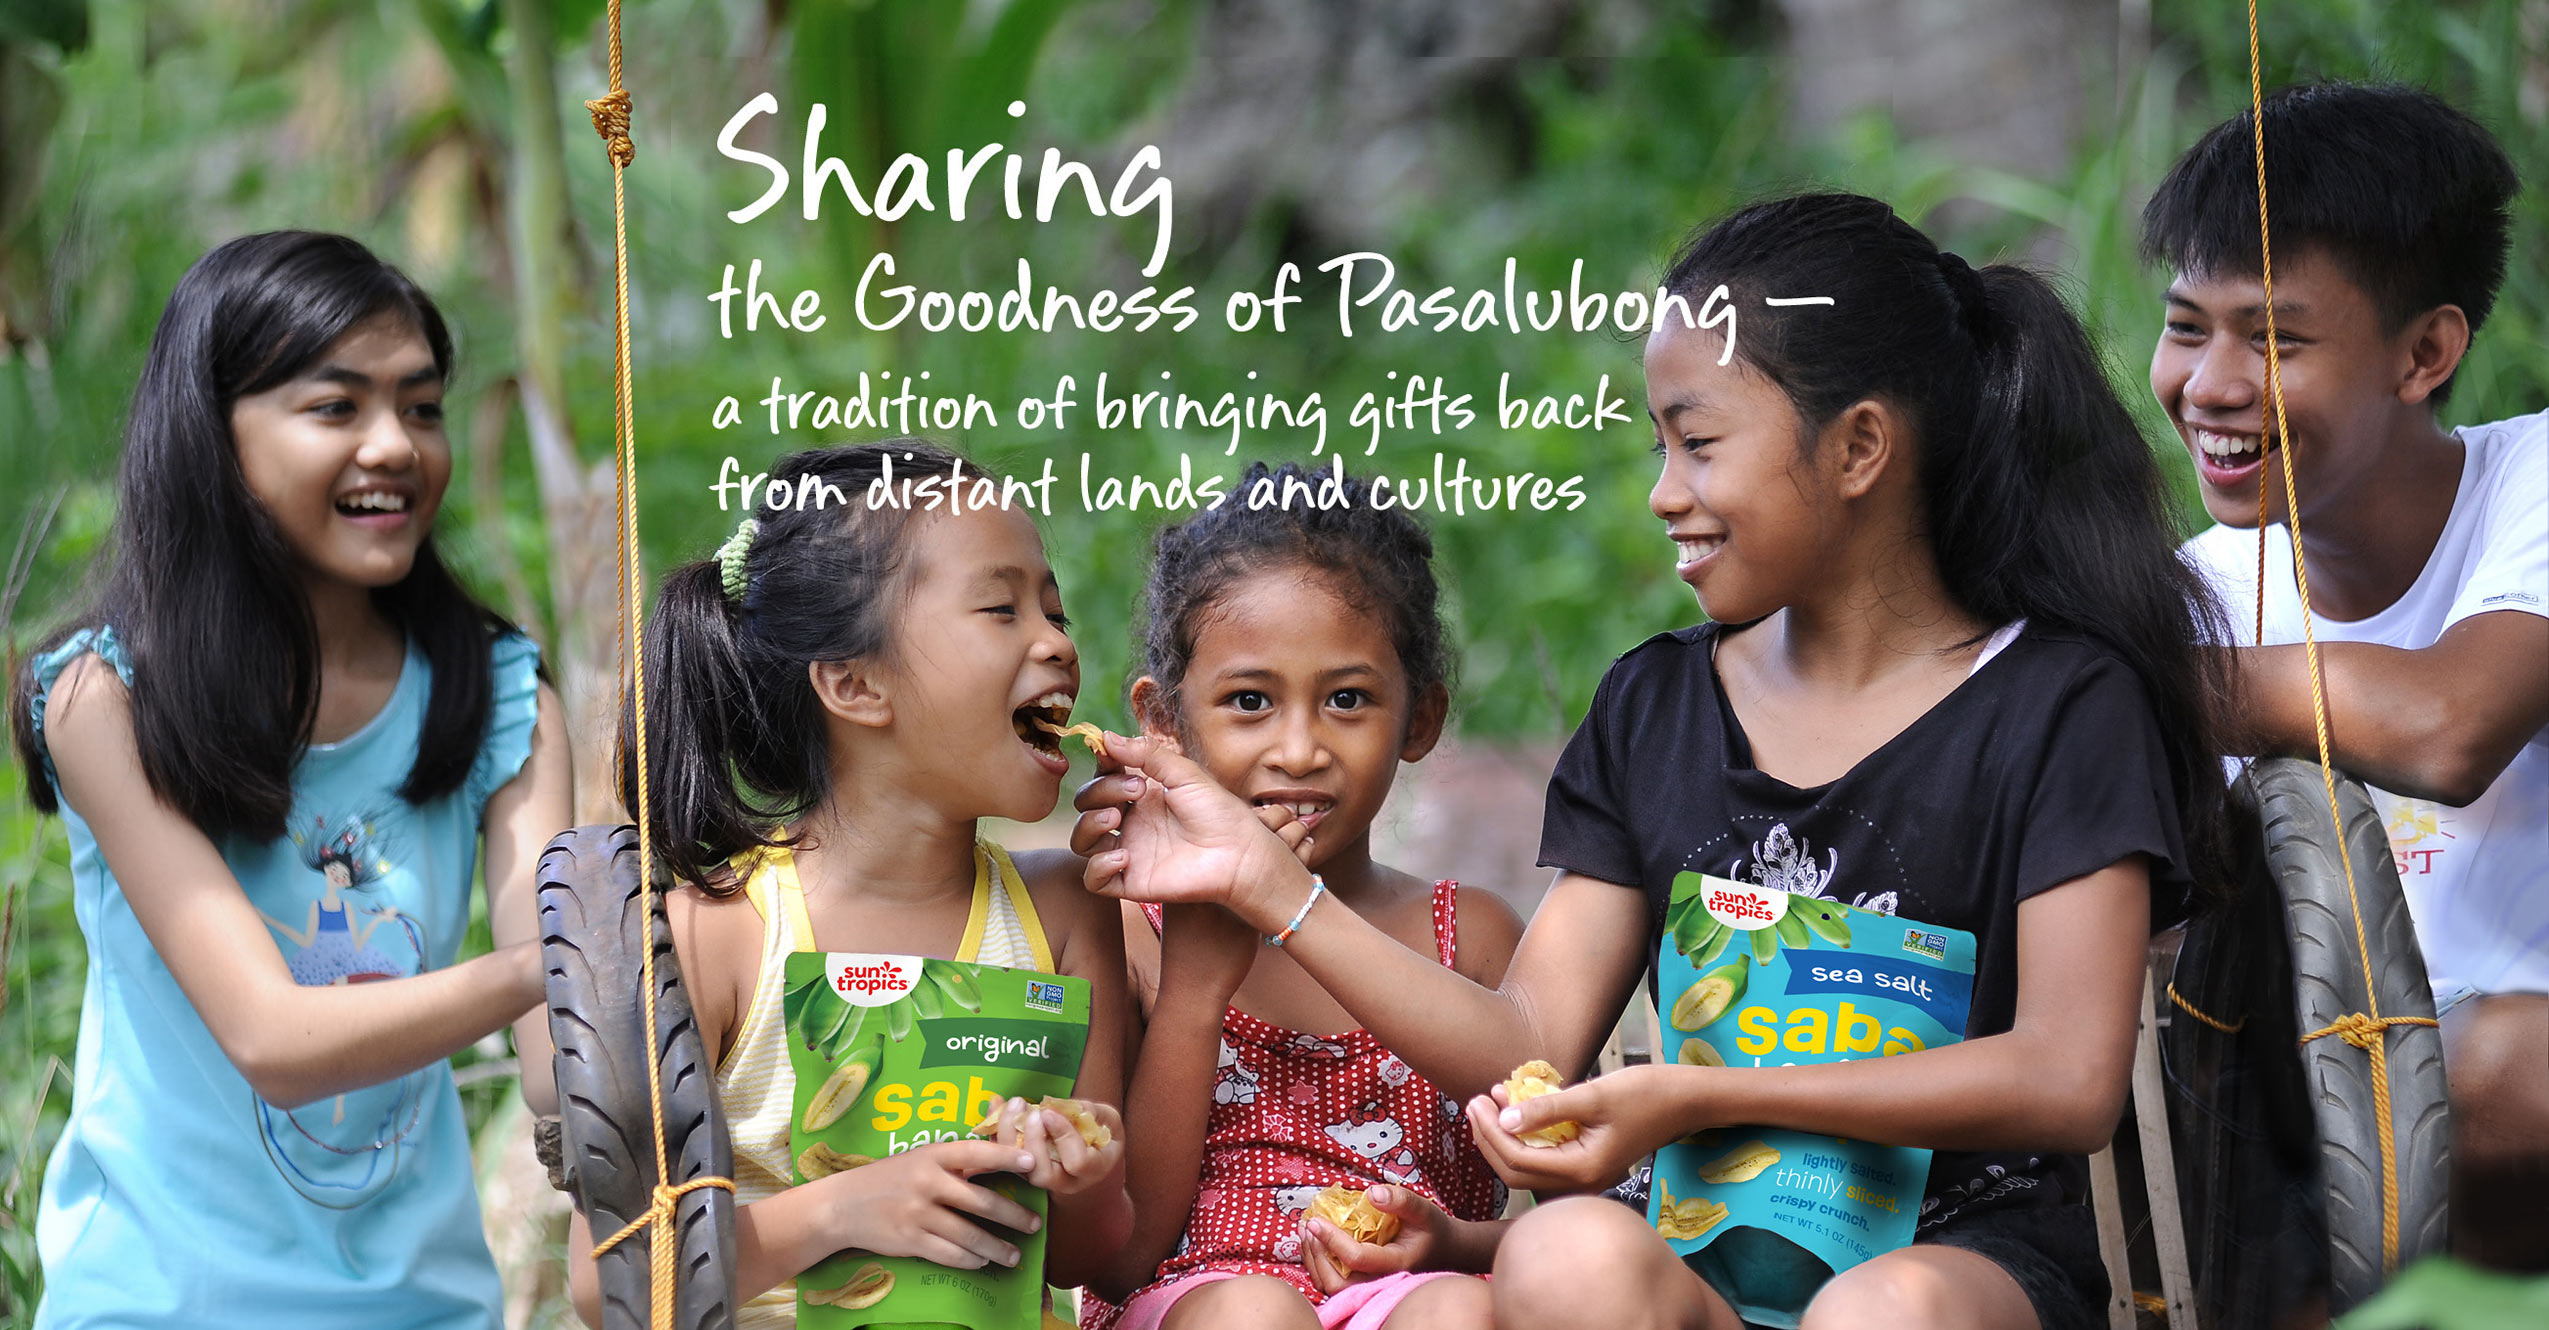 Sharing the goodness of Pasalubong